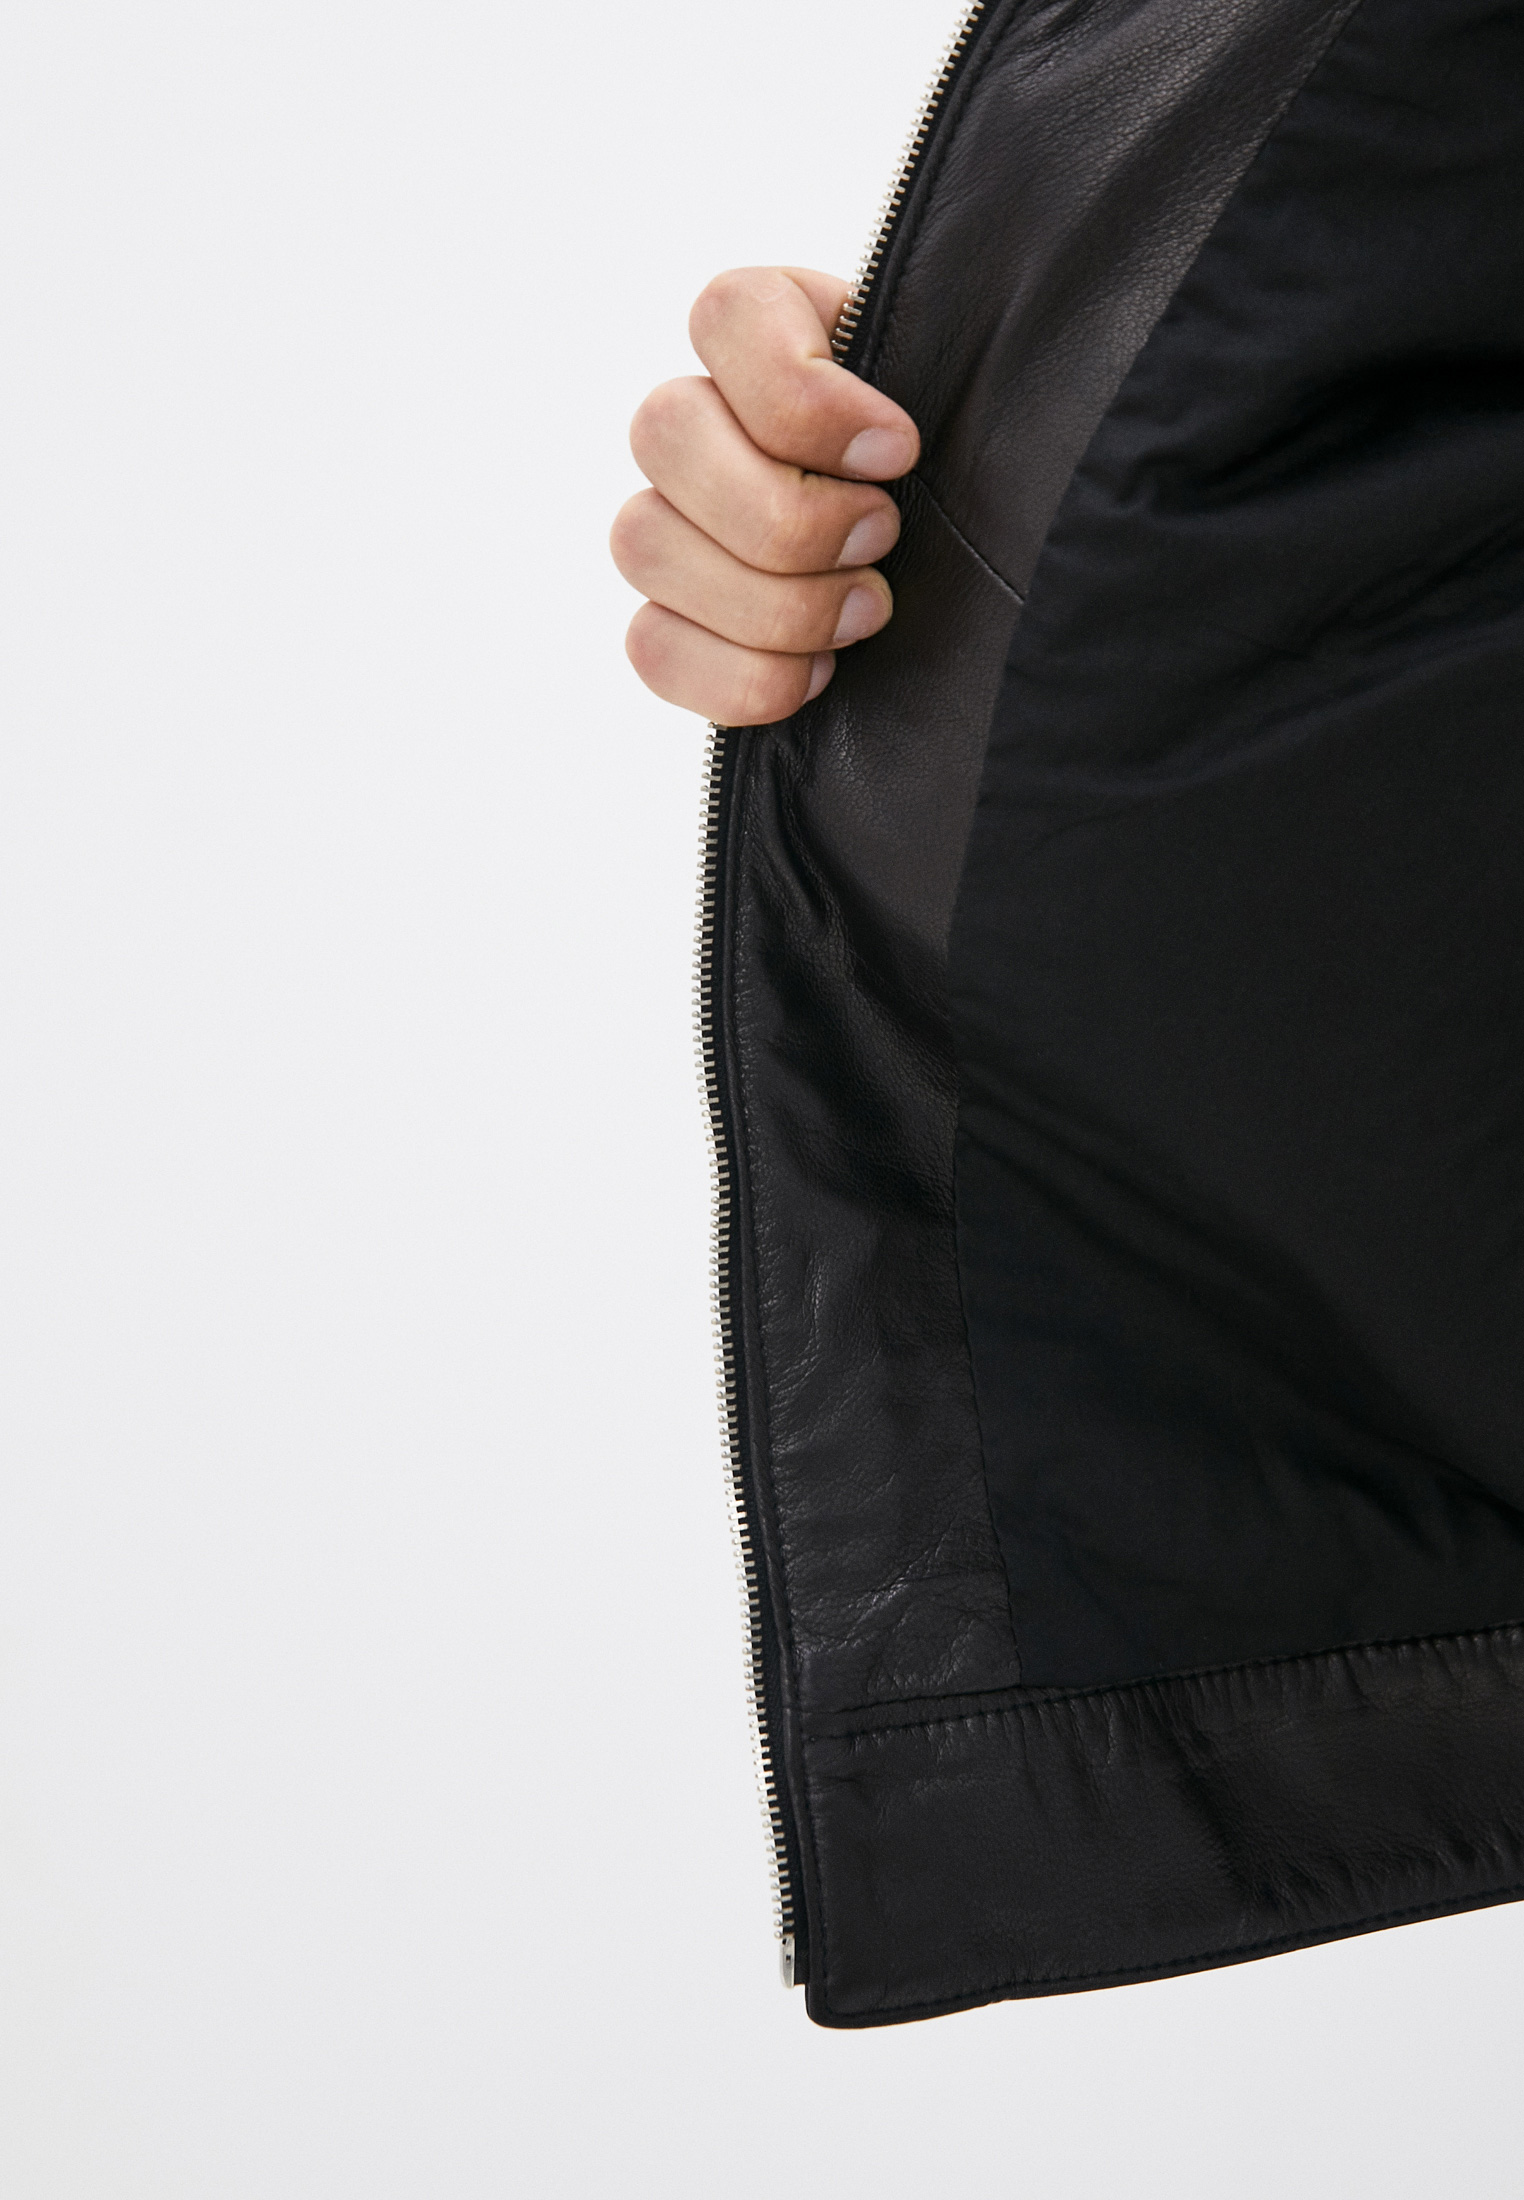 Кожаная куртка Bikkembergs (Биккембергс) C H 117 80 D 1180: изображение 5